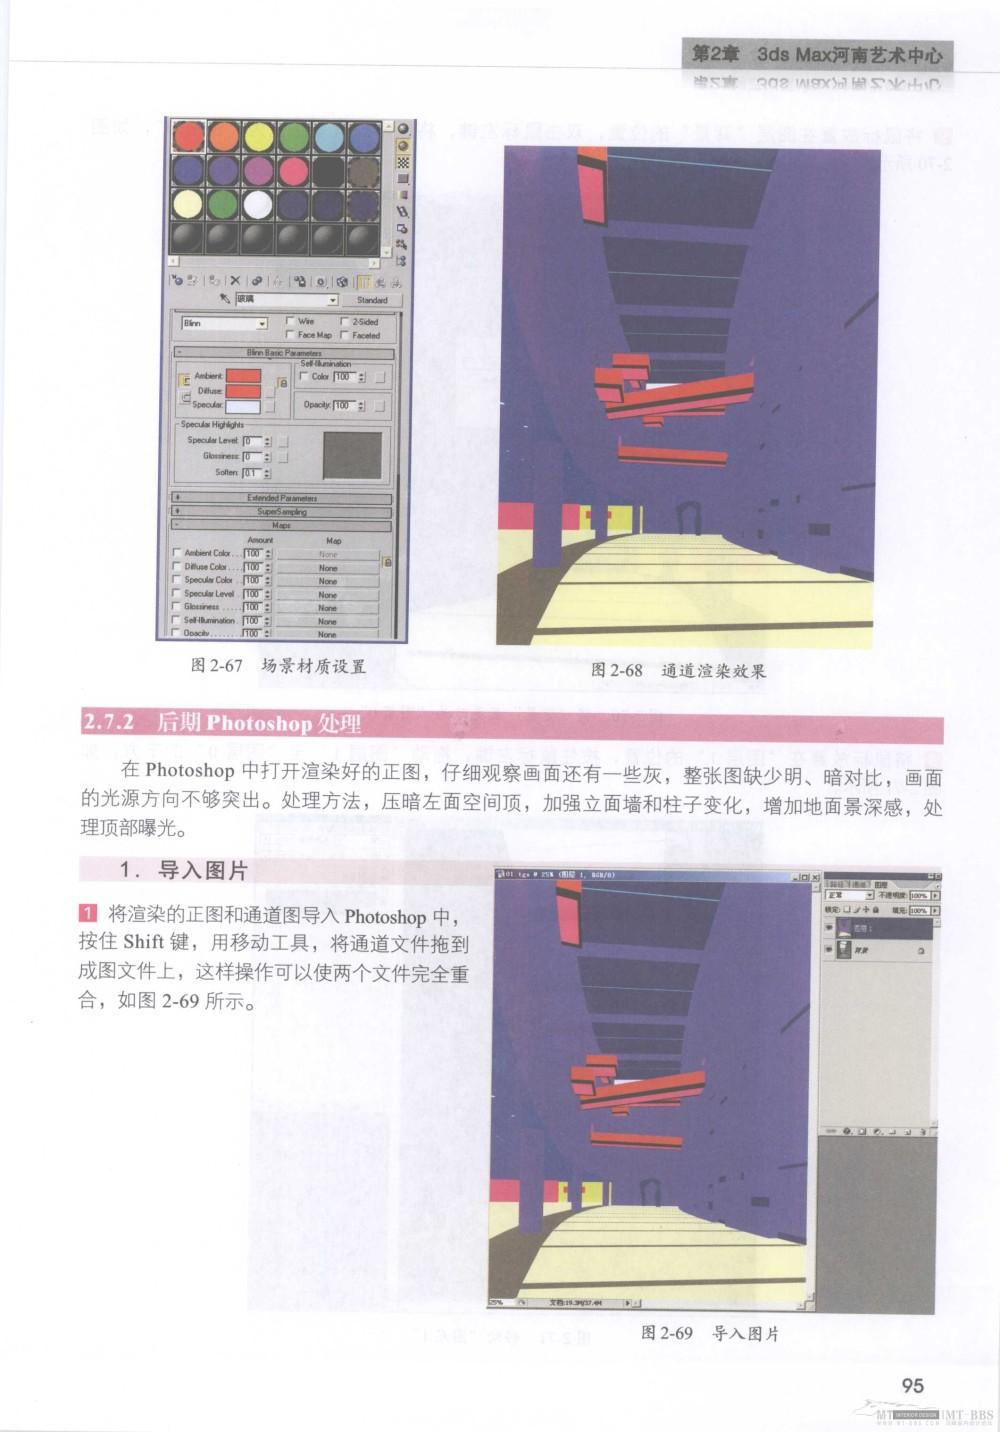 水晶石技法-3ds_Max&VRay室内空间表现_水晶石技法-3ds_Max&VRay室内空间表现_页面_101.jpg